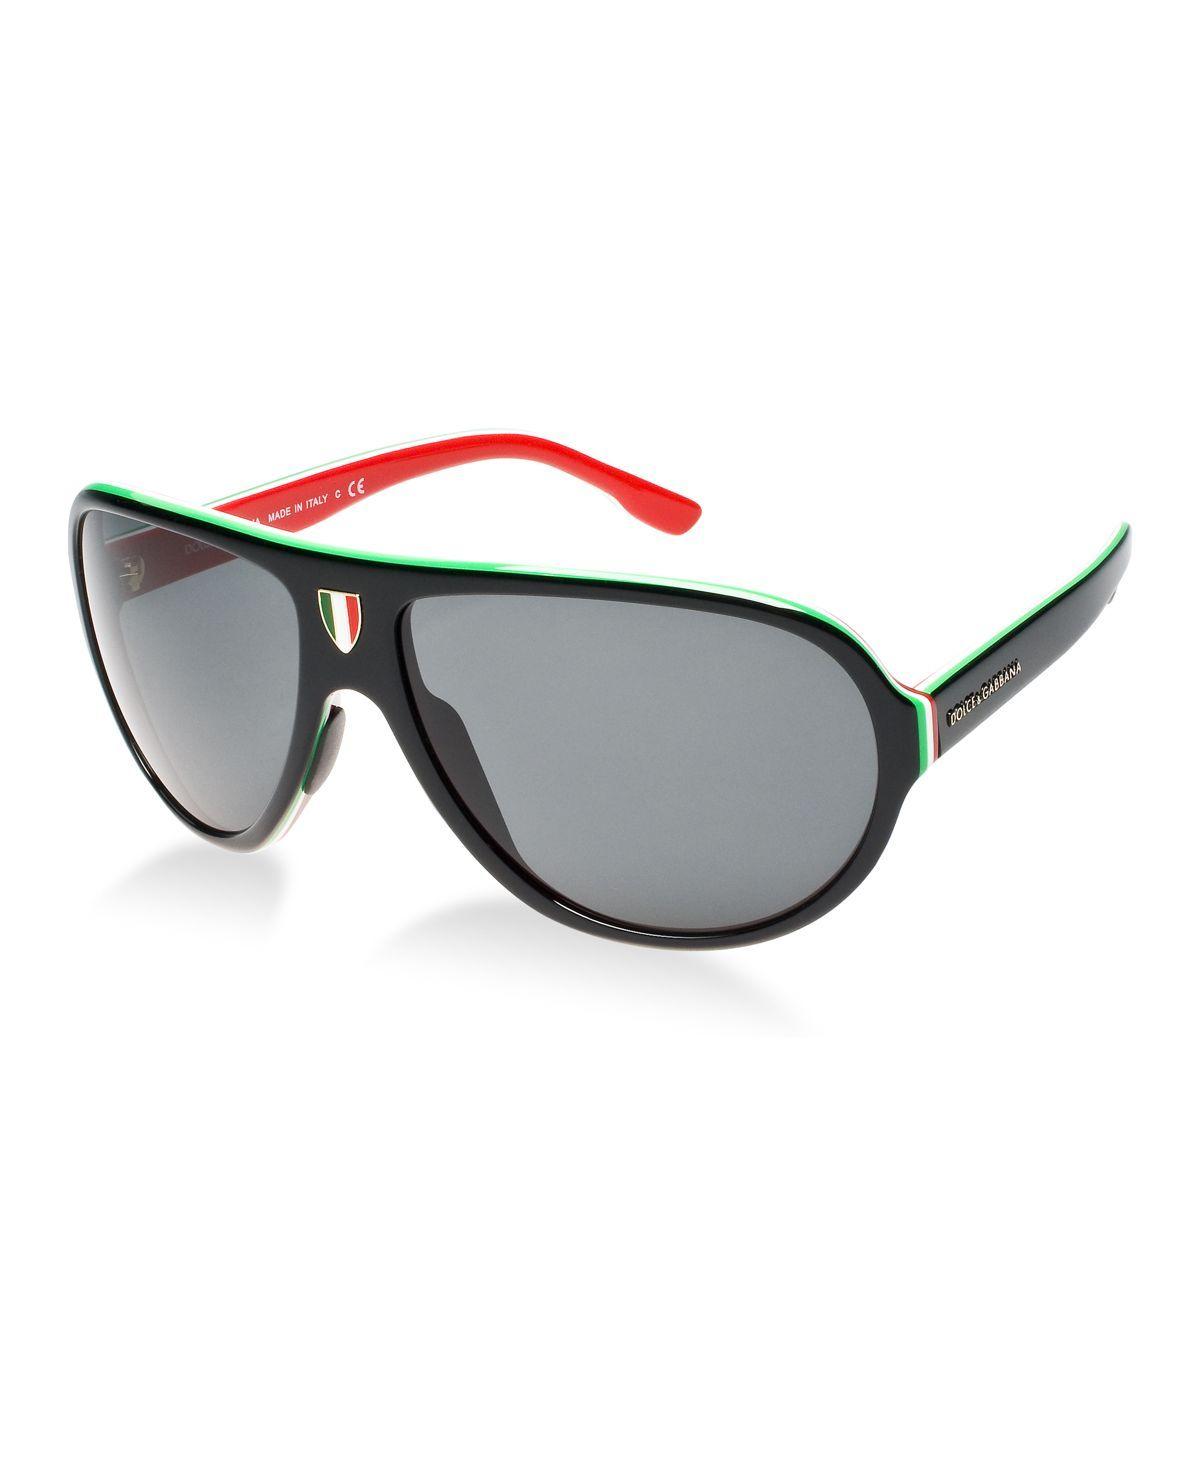 db410d5409 Dolce & Gabbana Sunglasses, DG4057   Products   Sunglasses, Mens ...